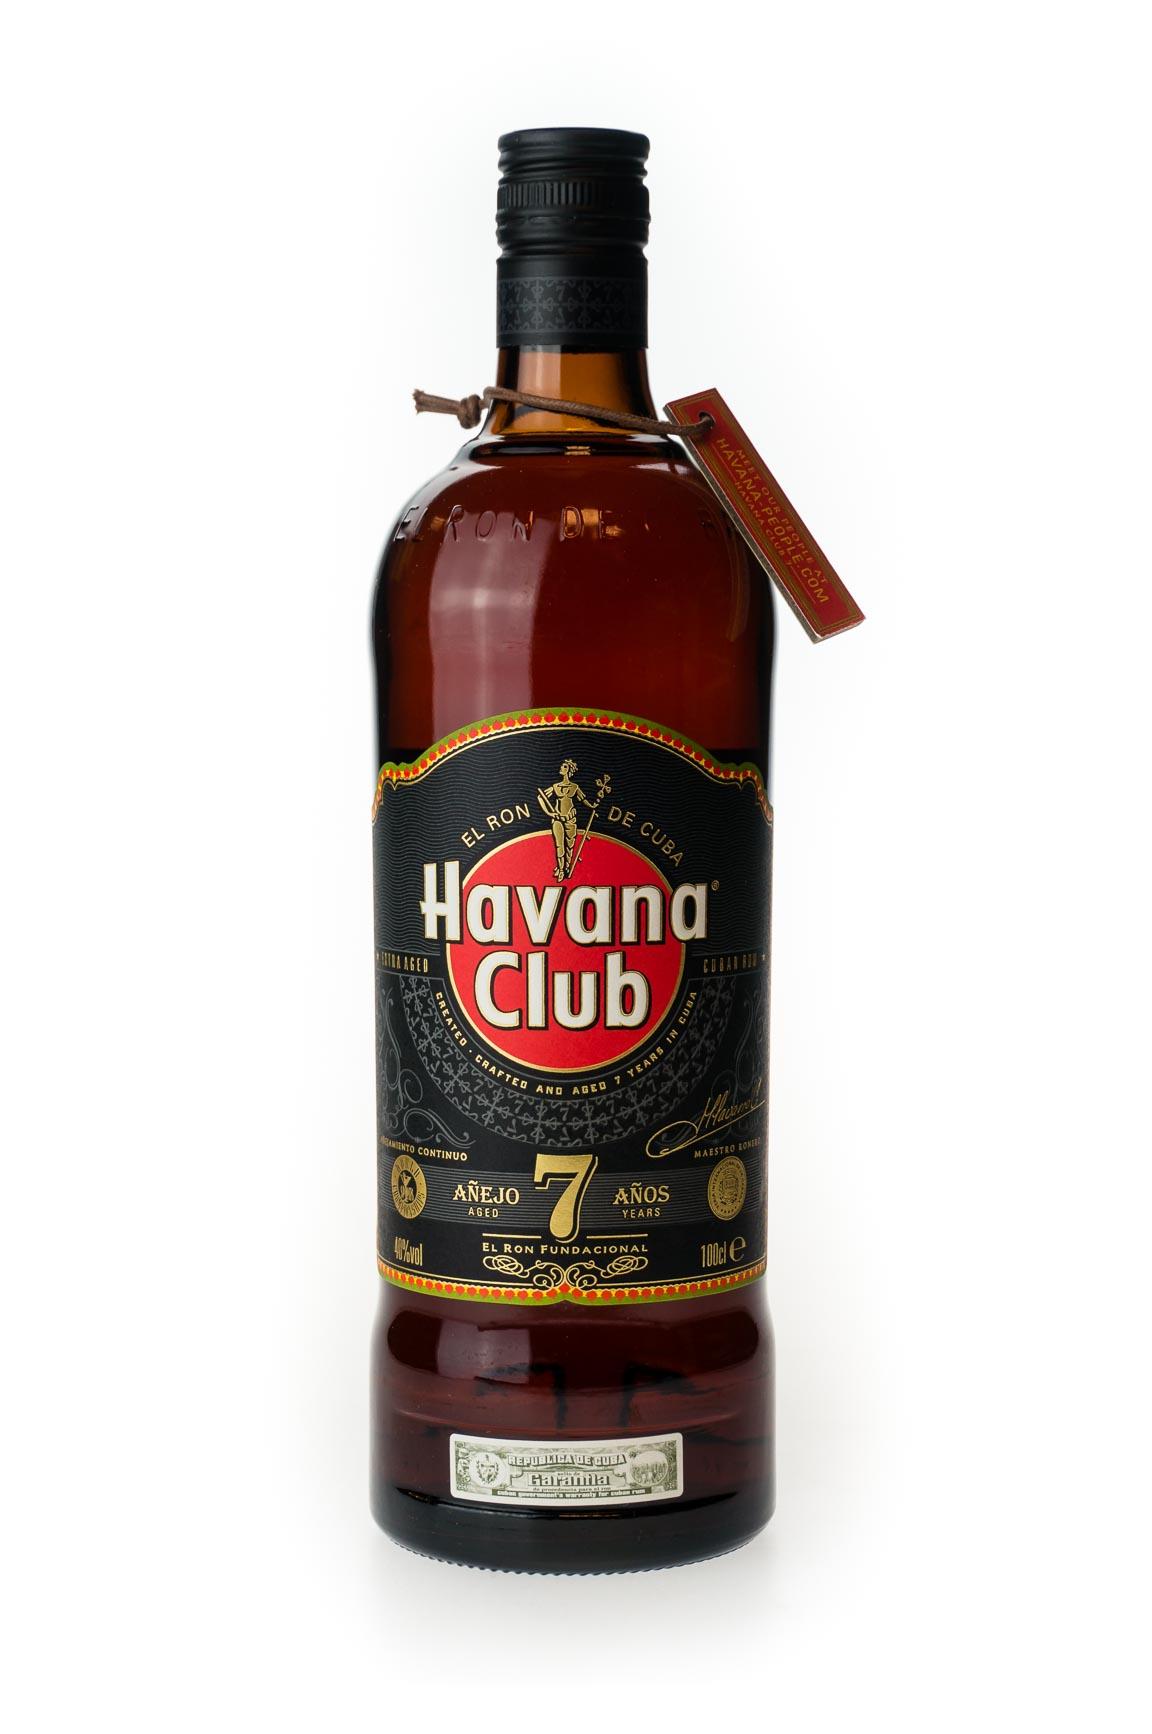 [Citti-Märkte] Havana Club Añejo 7 Años 40% 1Liter für 23,99€